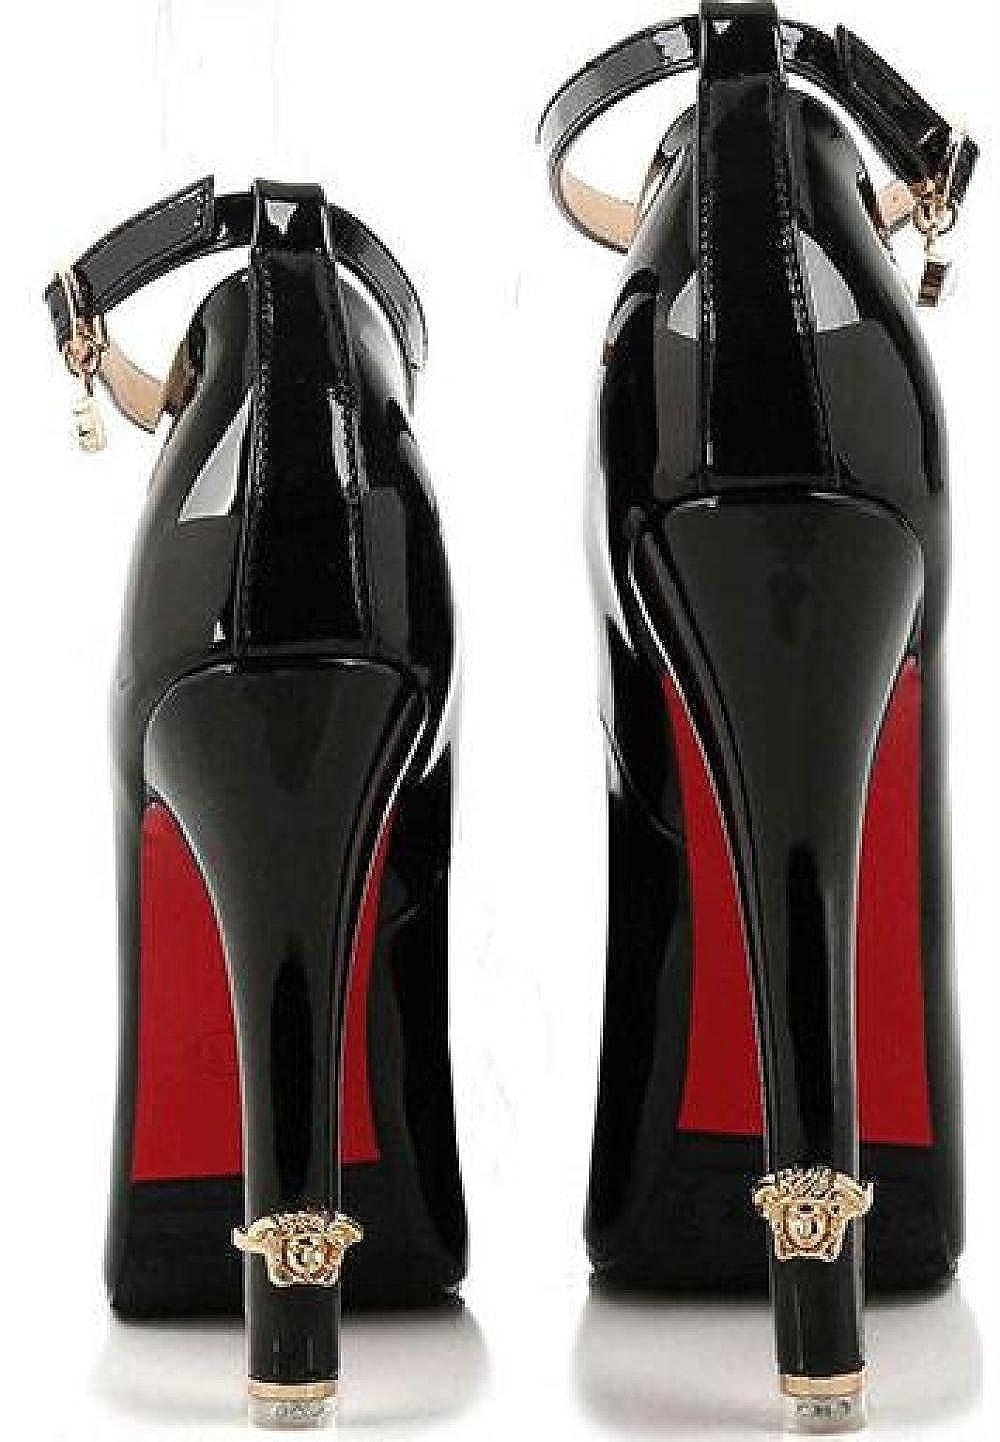 KNGMGK Tacones Taiwán A Prueba De Agua Zapatos De De De La Princesa Zapatos Sueltos Zapatos De Mujer 4b8b93